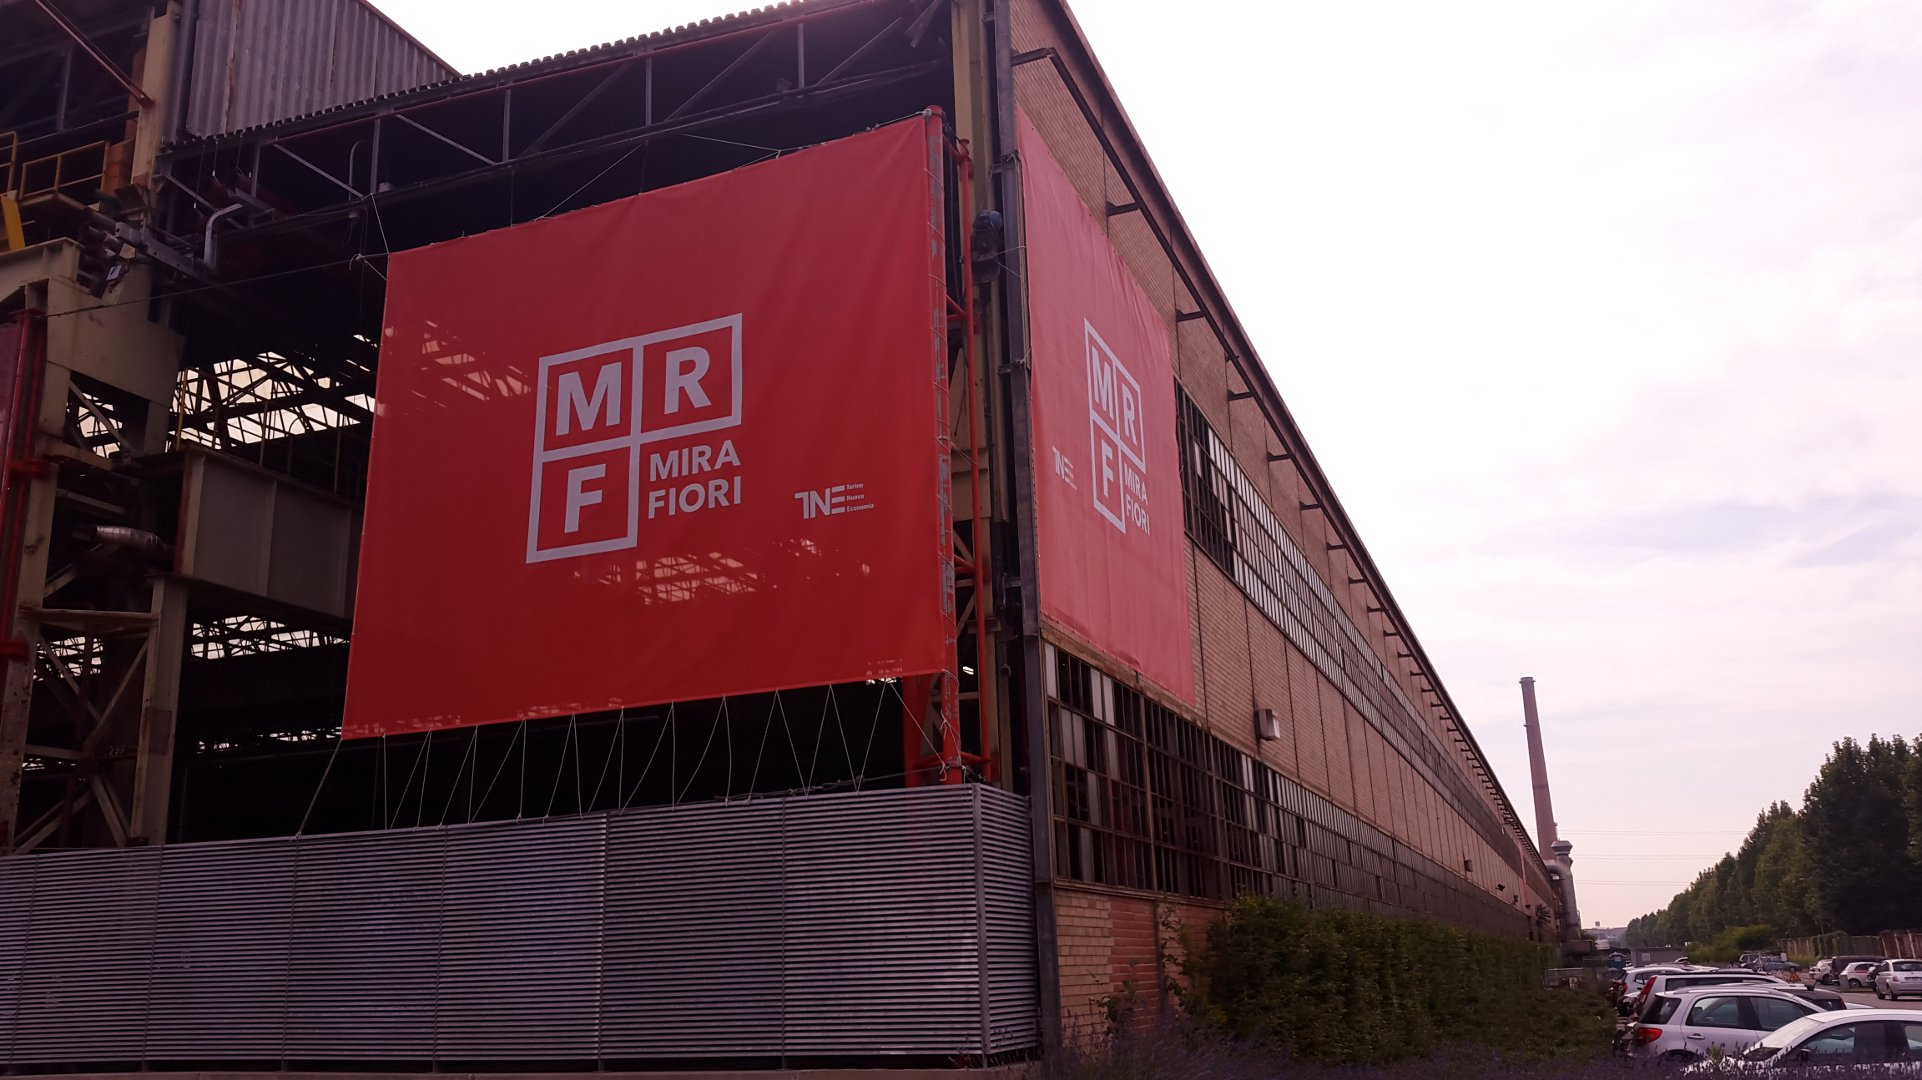 A bit of [hi]story 2017 13-14 maggio a Torino